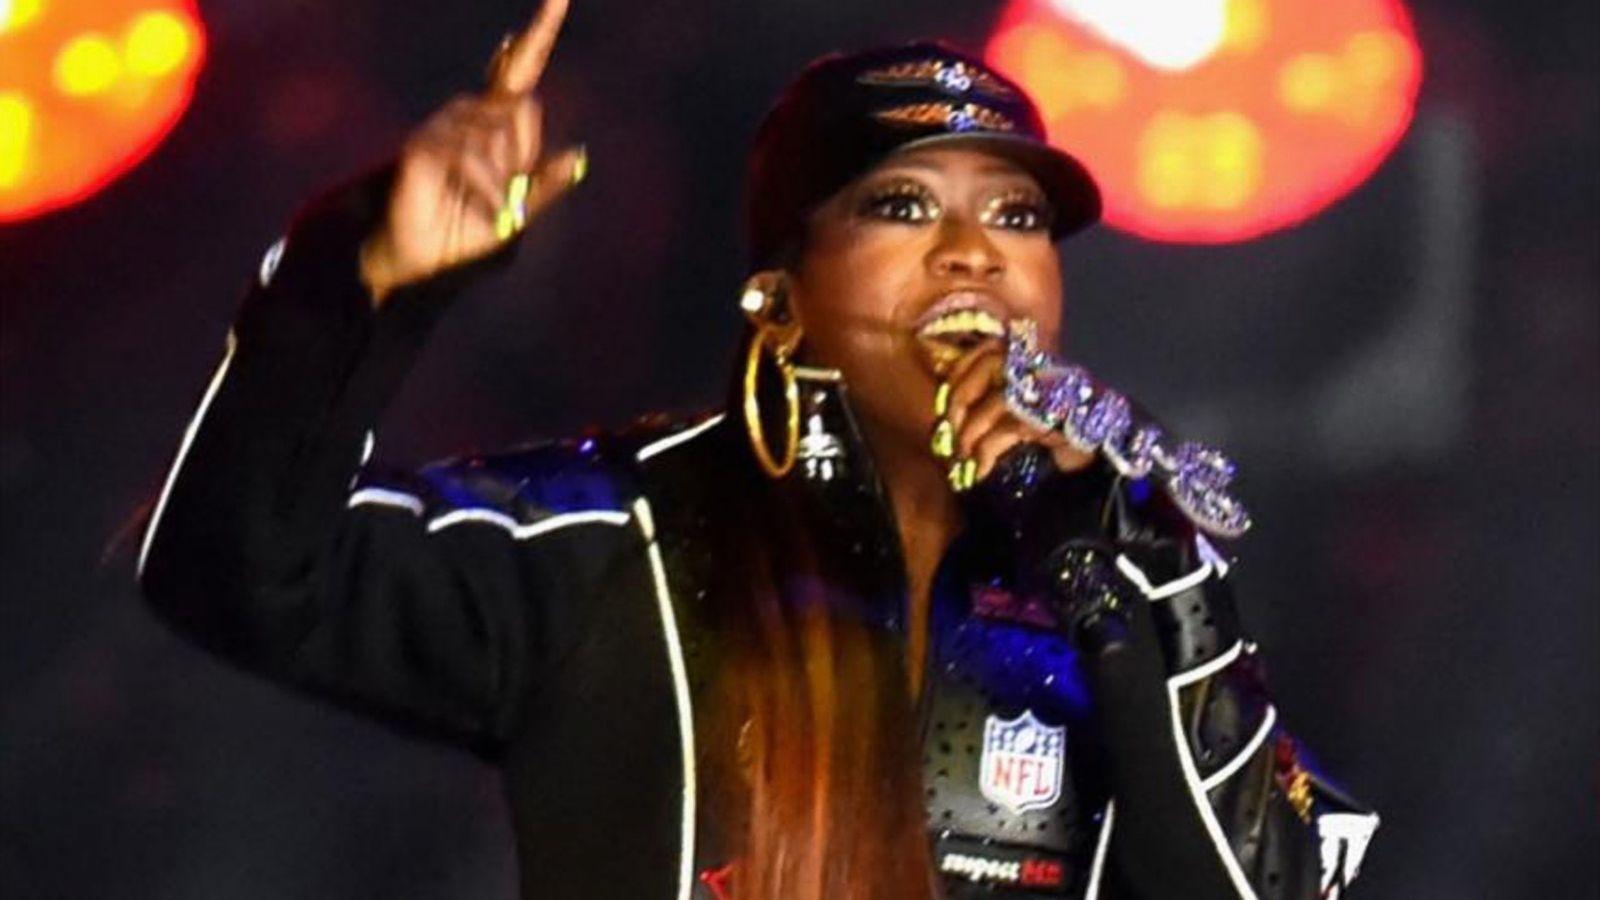 Missy Elliott's Emotional Reaction To Her Super Bowl with regard to Missy Elliott Super Bowl